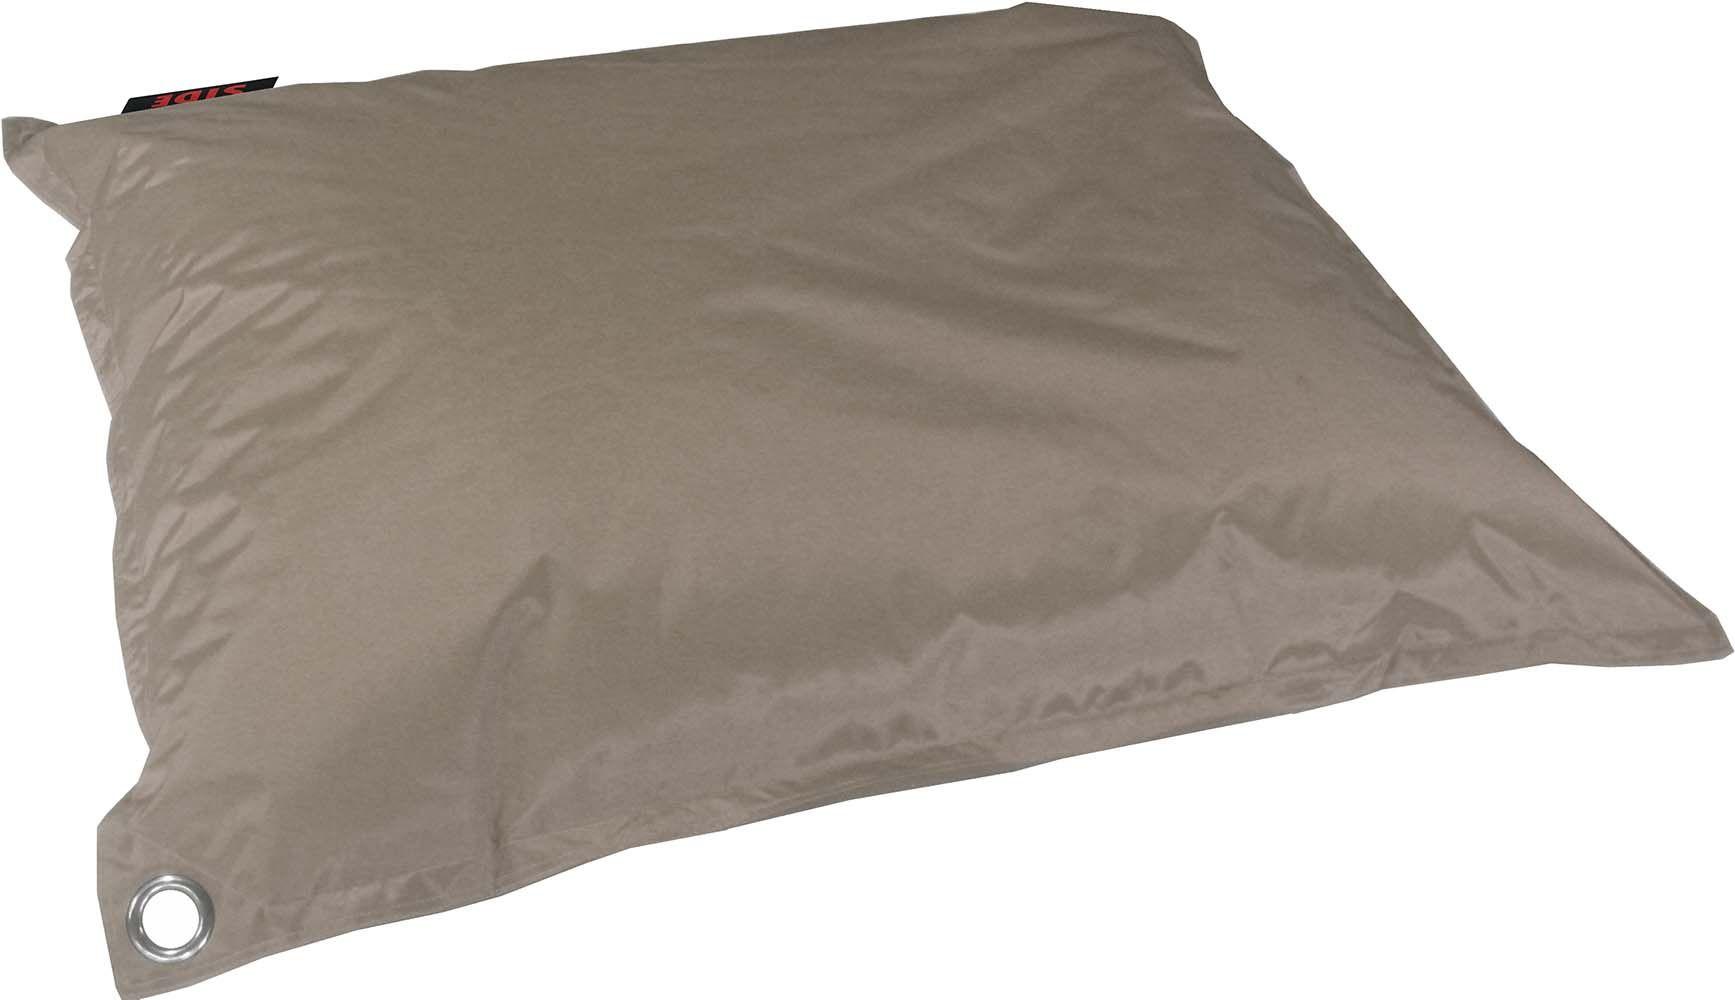 grand coussin uni maxi taupe. Black Bedroom Furniture Sets. Home Design Ideas